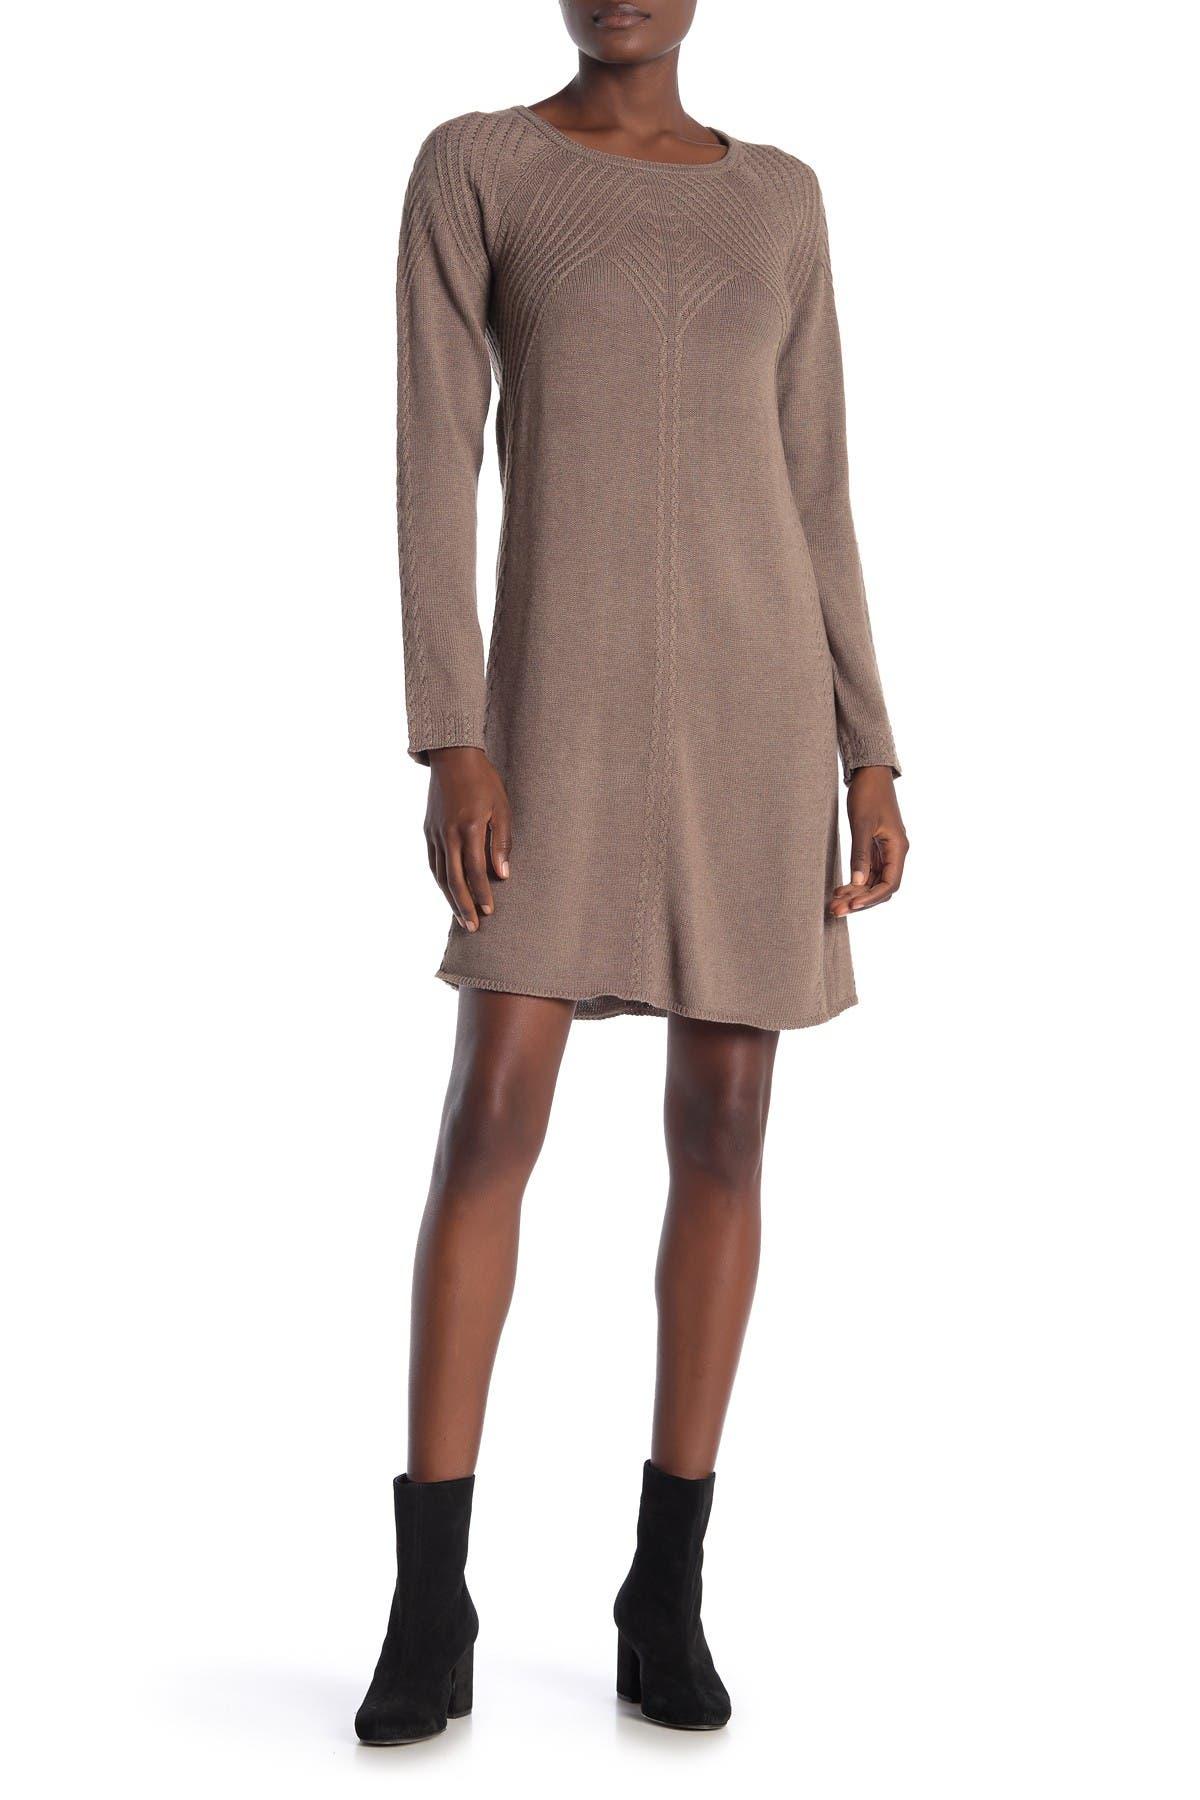 Image of Max Studio Textured Long Sleeve Sweater Dress